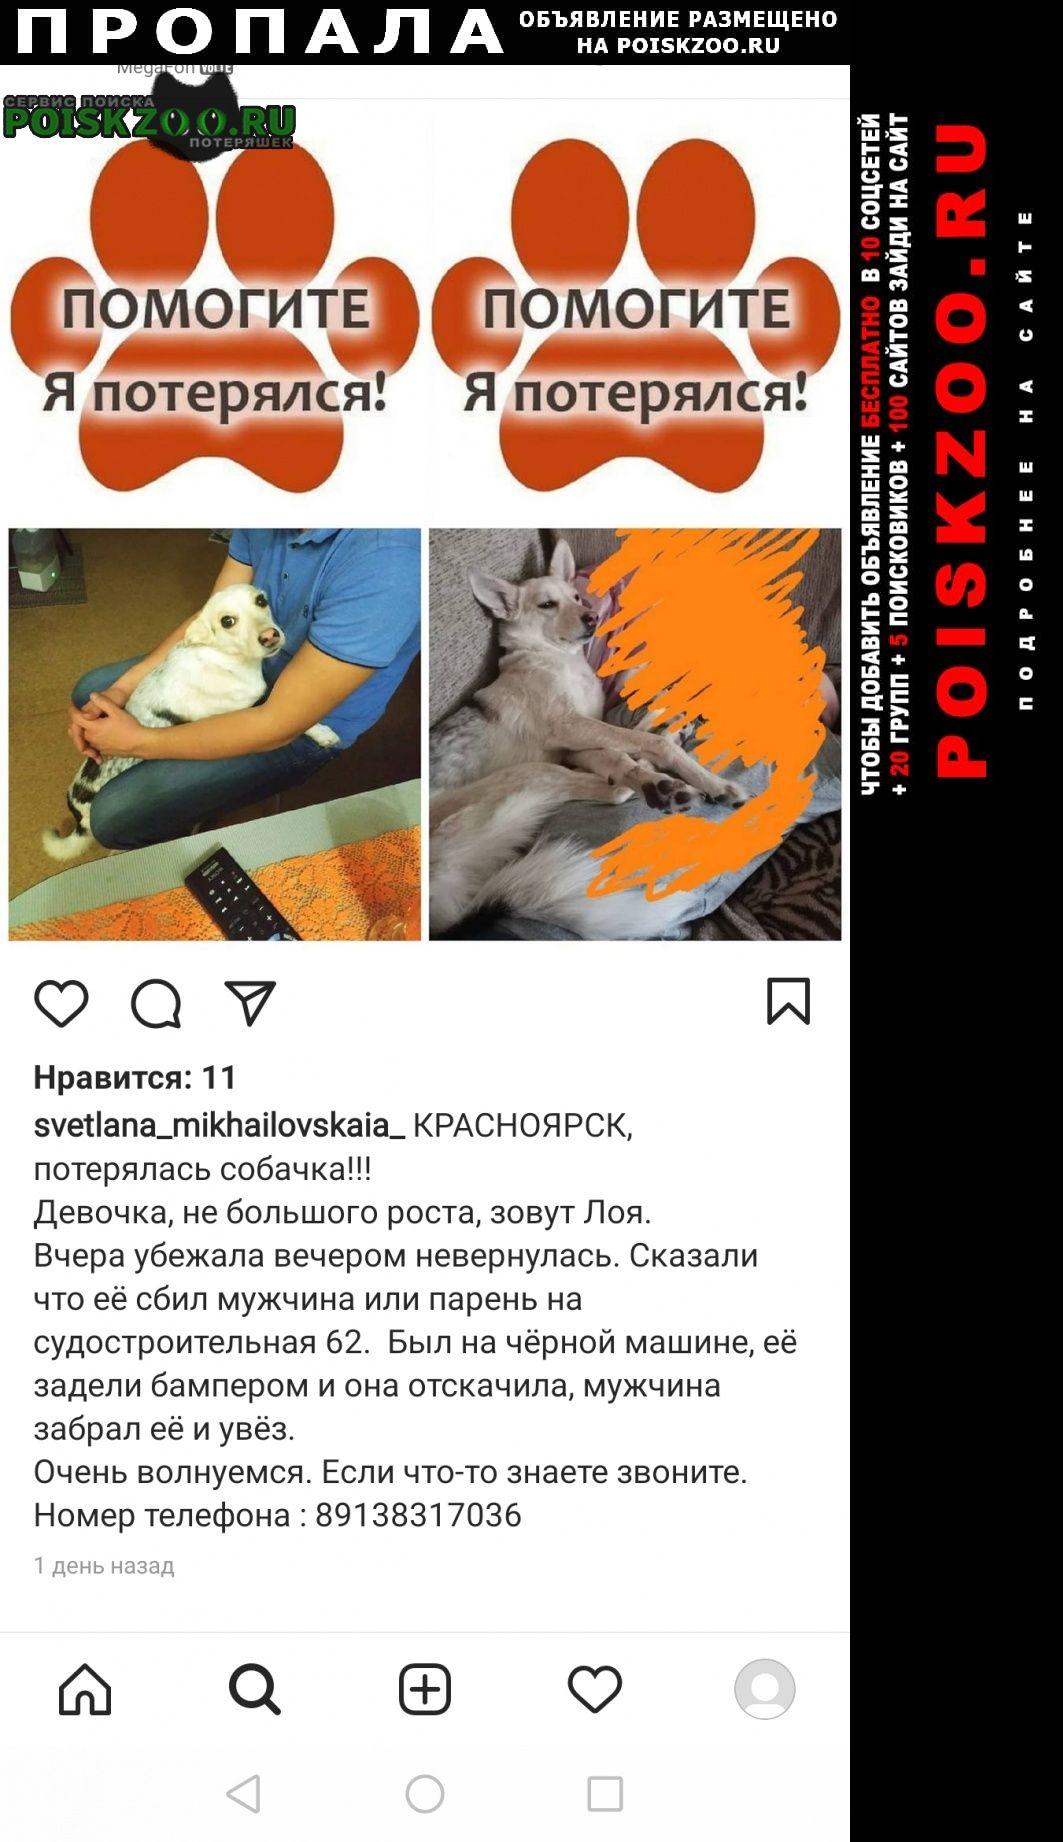 Пропала собака. Красноярск